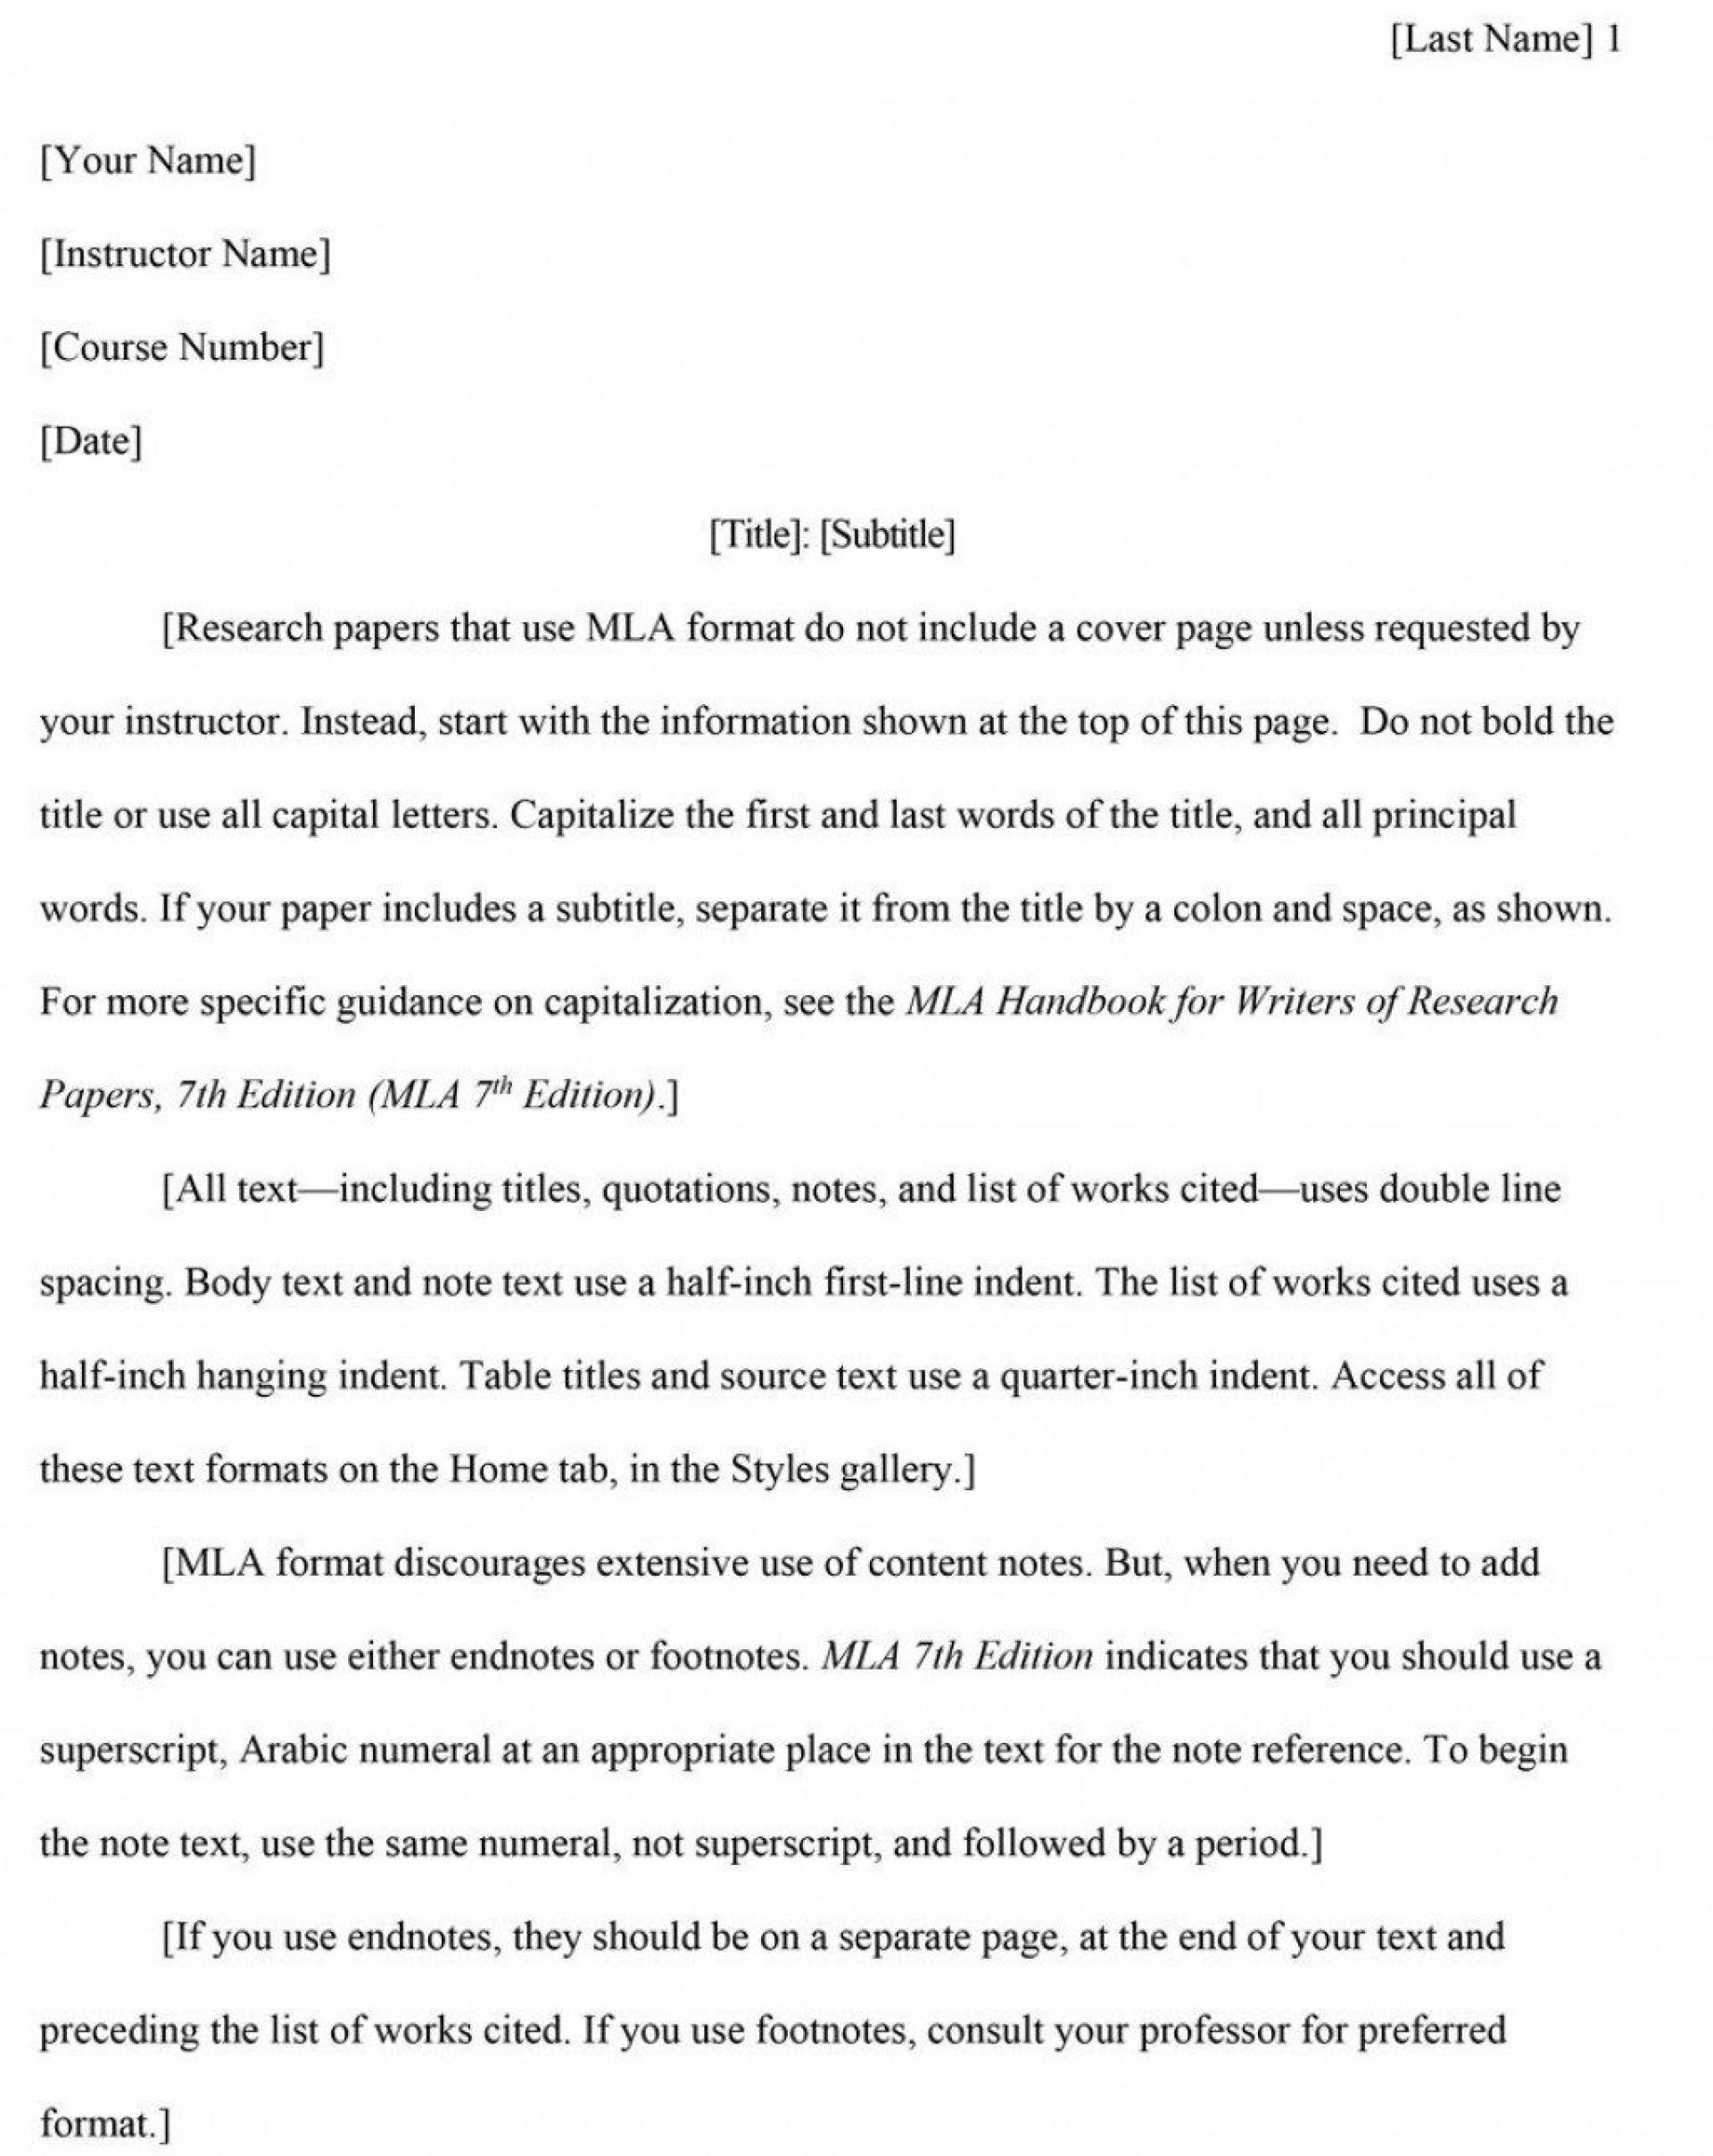 006 Sensational Research Paper Proposal Template Apa Example 1920